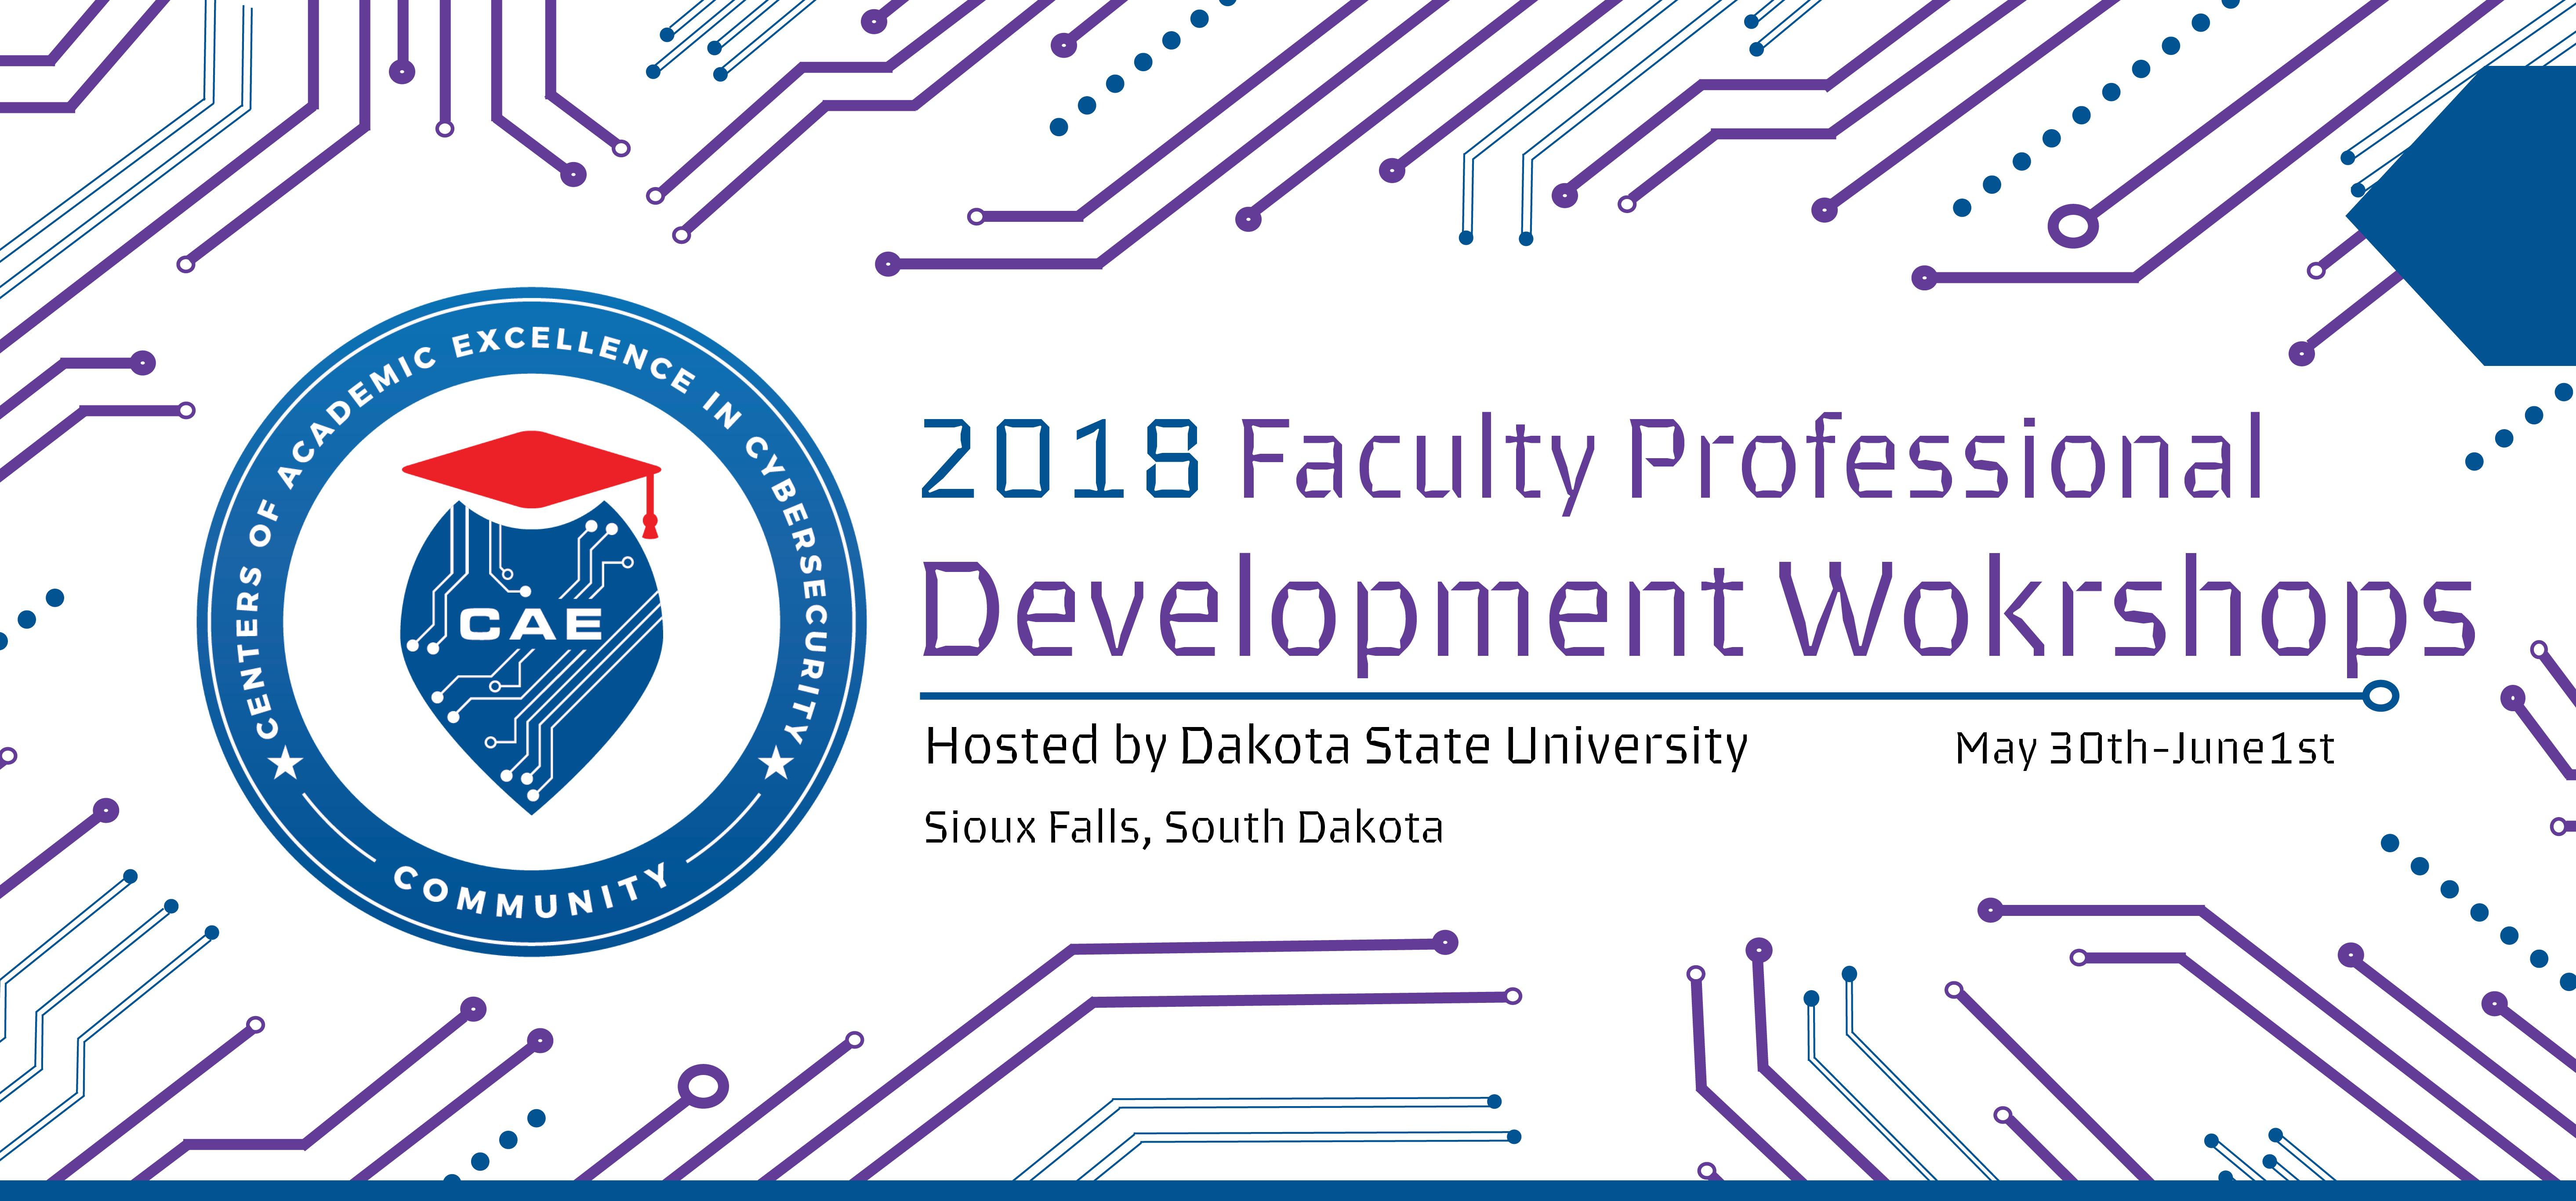 Faculty Professional Development Workshop Cae Community